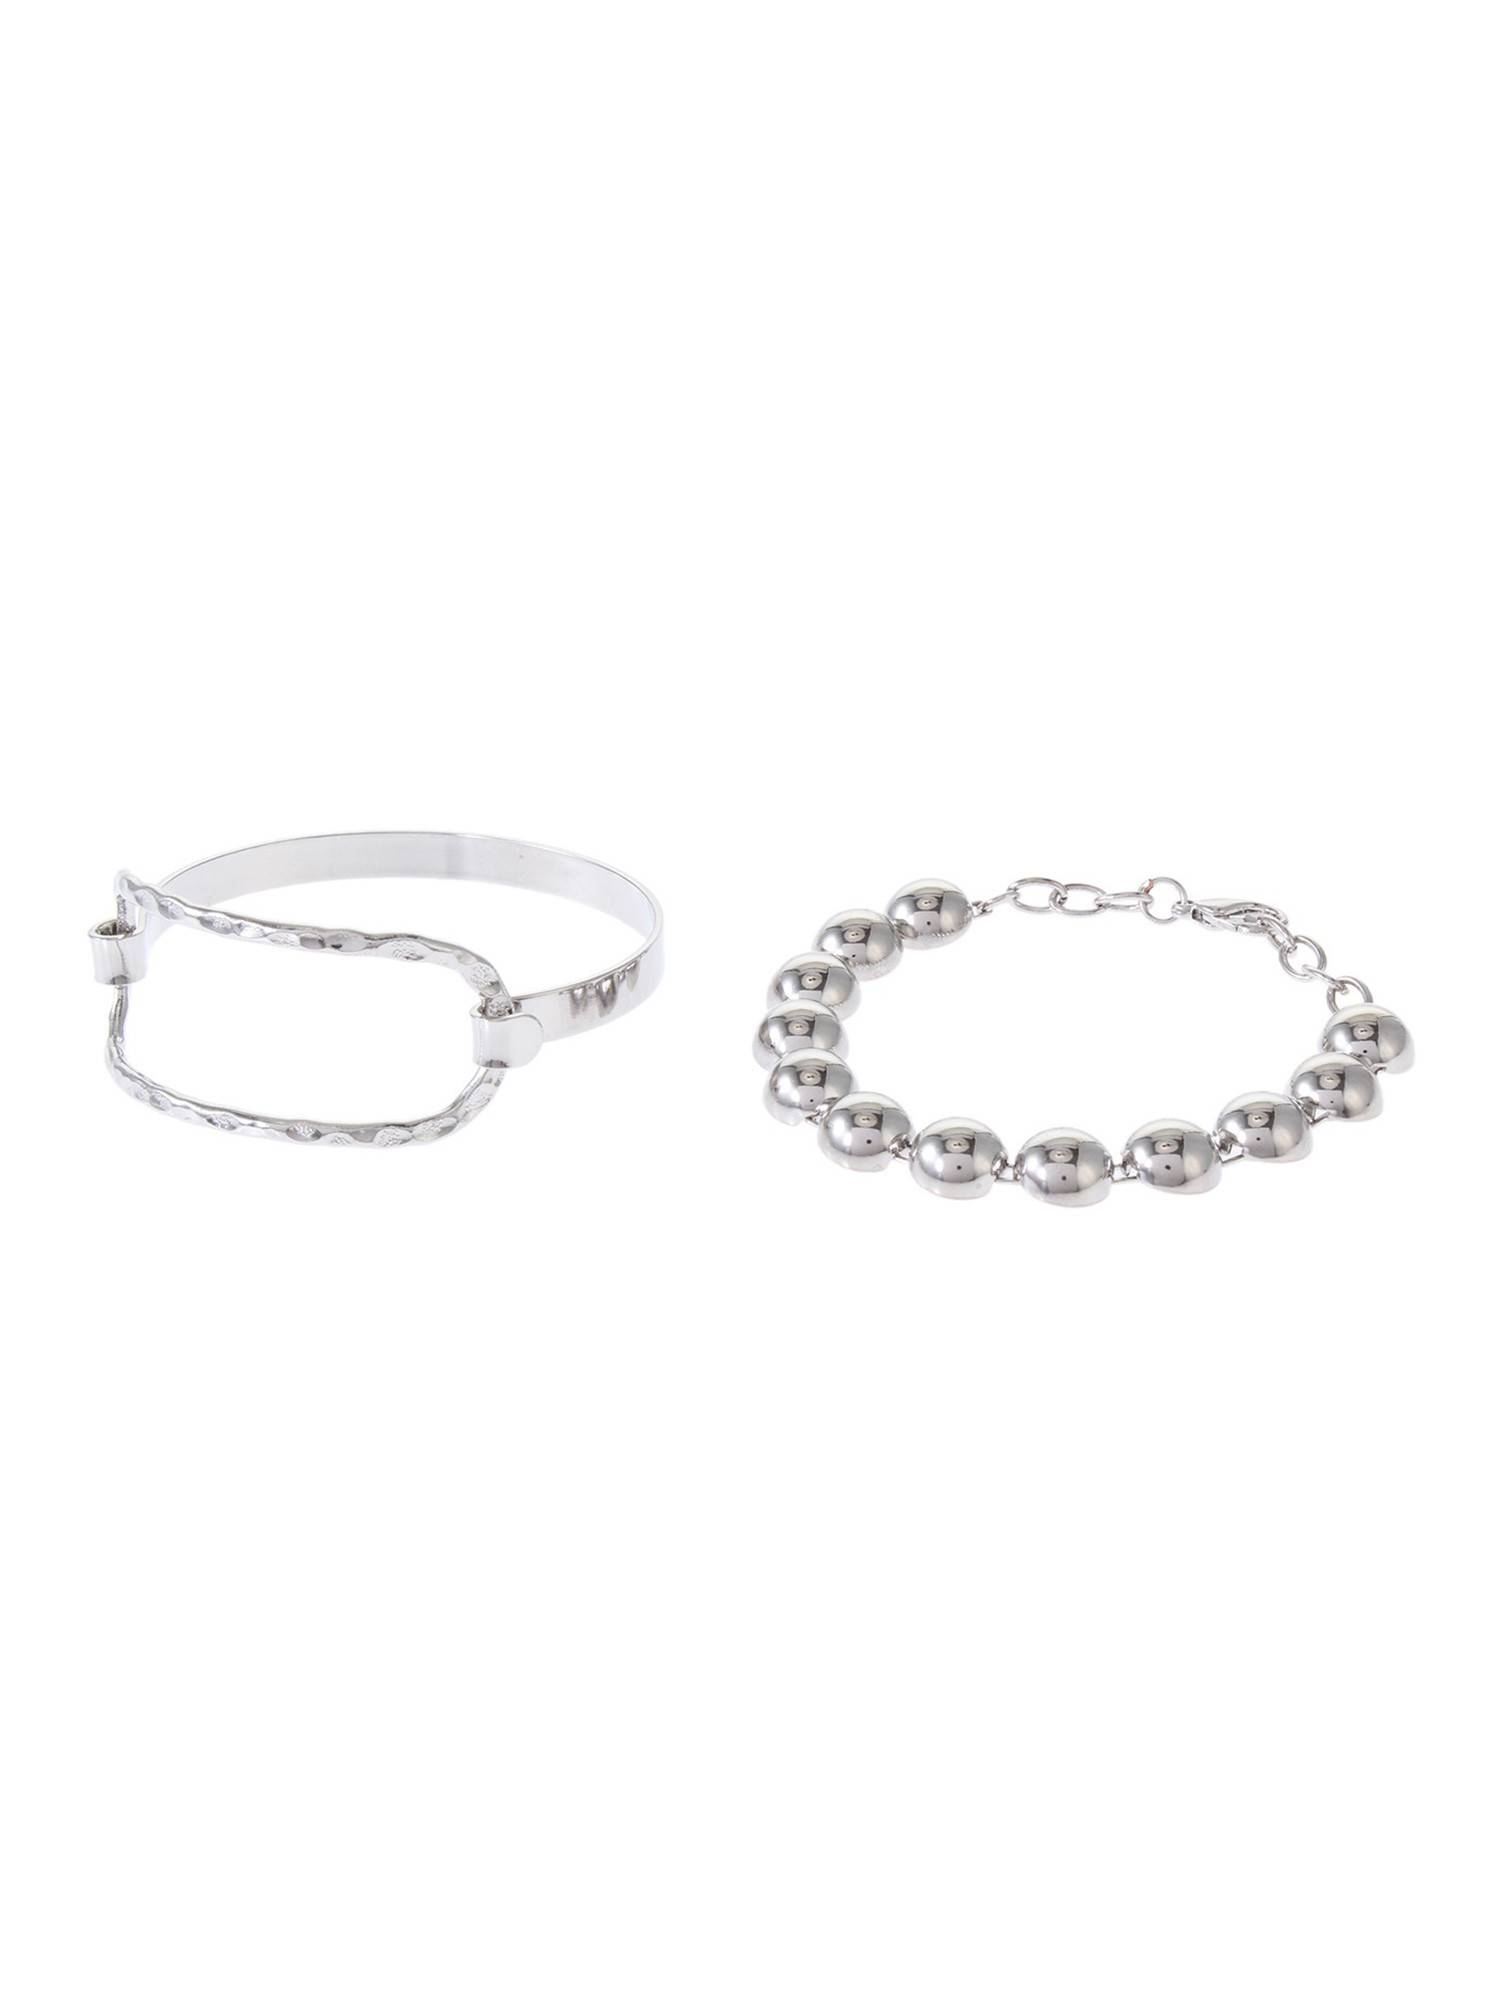 Ball chain metal bracelet